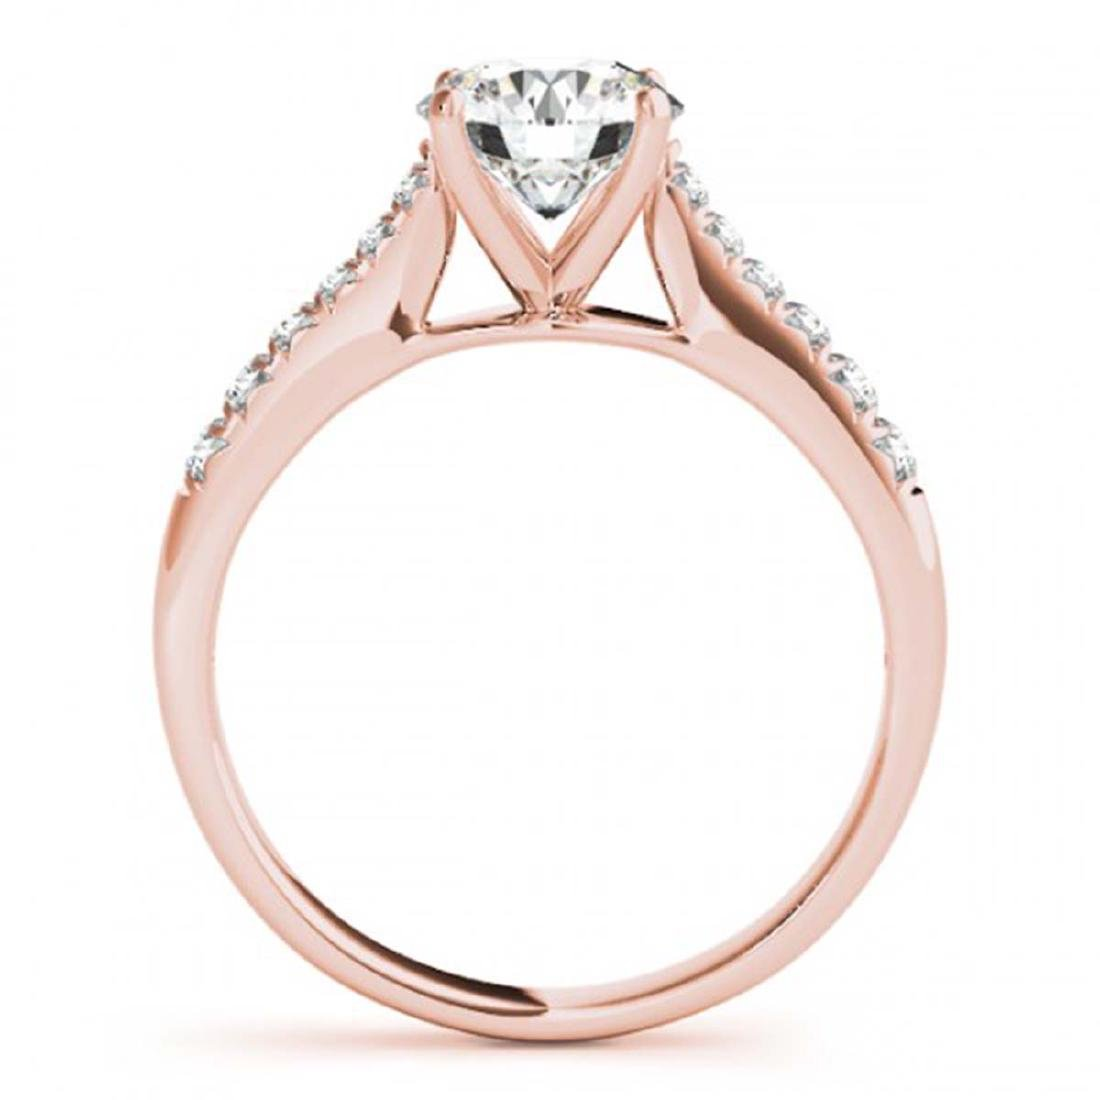 1.25 ctw VS/SI Diamond Solitaire Ring 14K Rose Gold - - 2